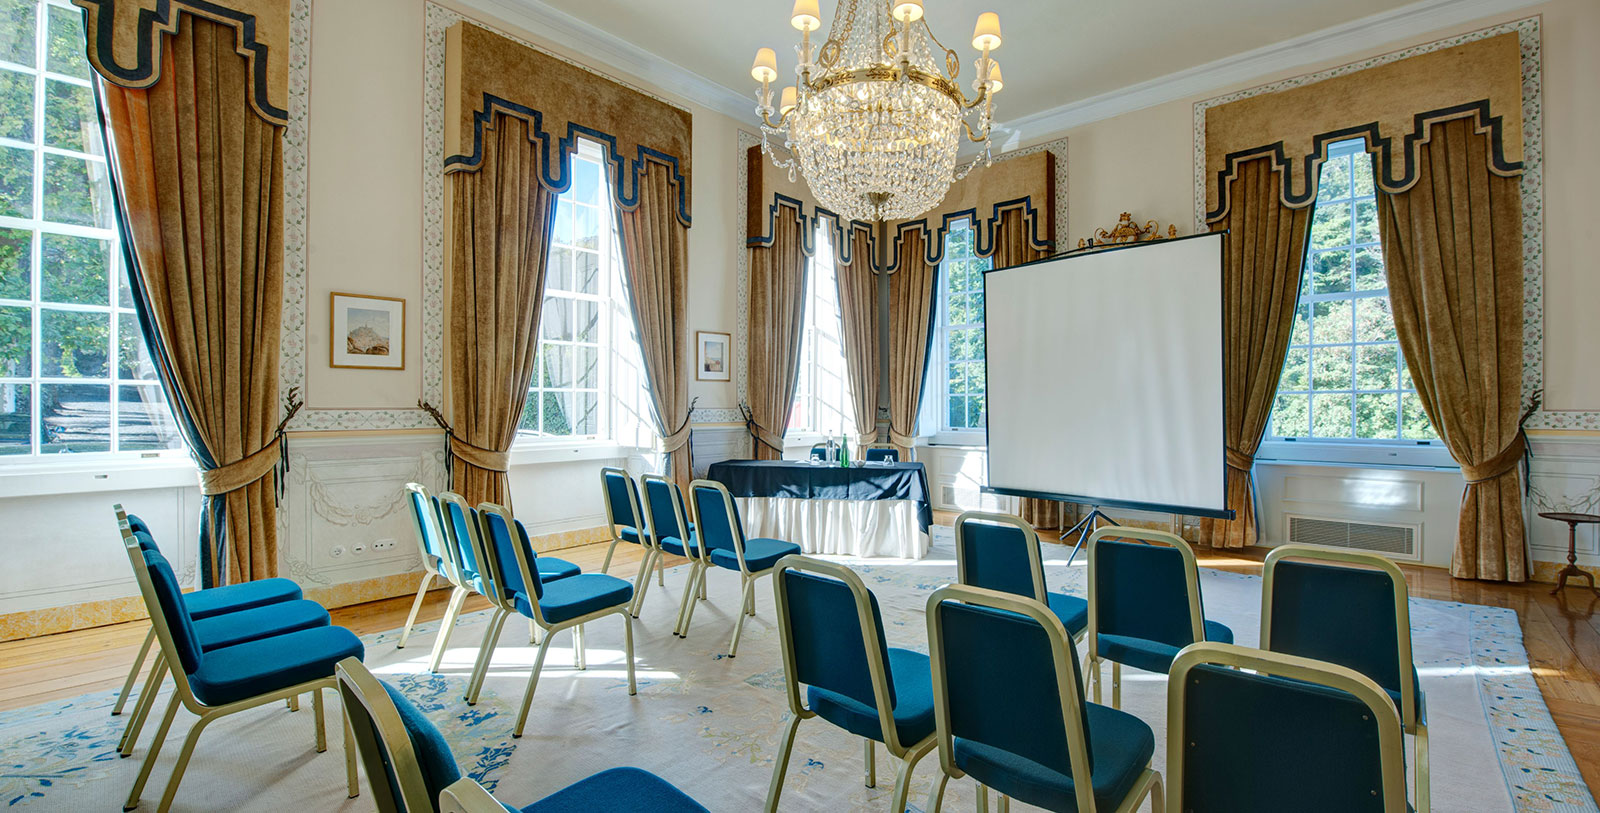 Image of Image of D Joao VI Plateia Room Tivoli Palacio de Seteais Sintra Portugal, Request For Proposal